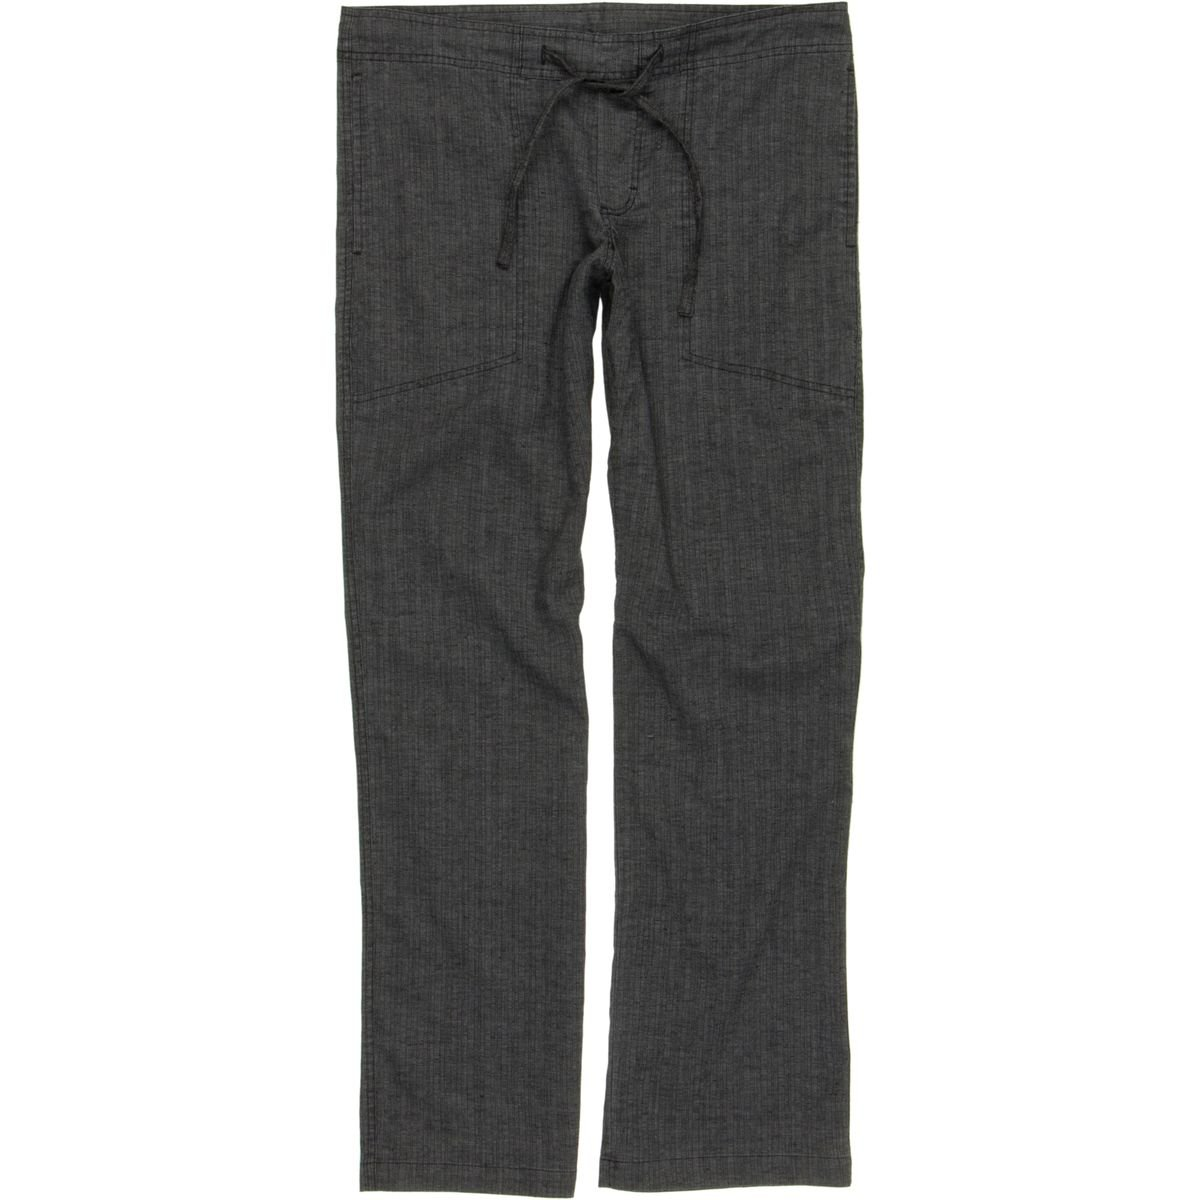 prAna Men's Sutra Pant, Black Herringbone, X-Large